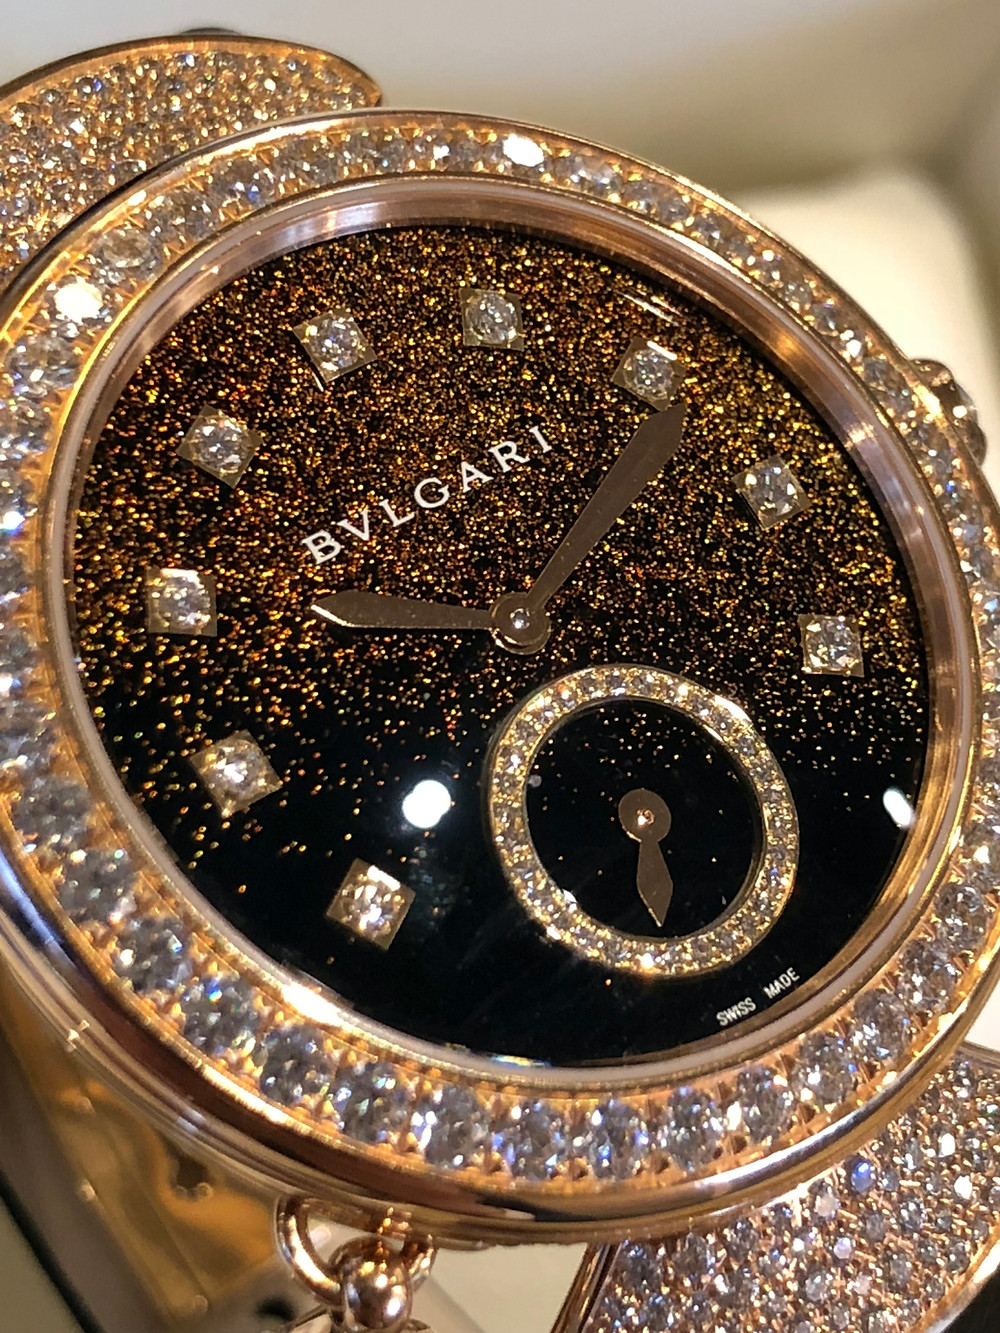 DIVAS' DREAM MINUTE REPEATER三問錶 37毫米直徑18k玫瑰金錶殼,錶耳以雪花式鋪鑲了明亮式切割美鑽 (共重約4.26克拉),日本傳統工藝Urushi繪漆技術製成黑漆與金塵錶盤/時分指示,小秒針/自製Calibre BVL 362 Finissimo型號人手上鍊三問機芯,52小時動力儲存/防水功能達30米,限量發售5枚